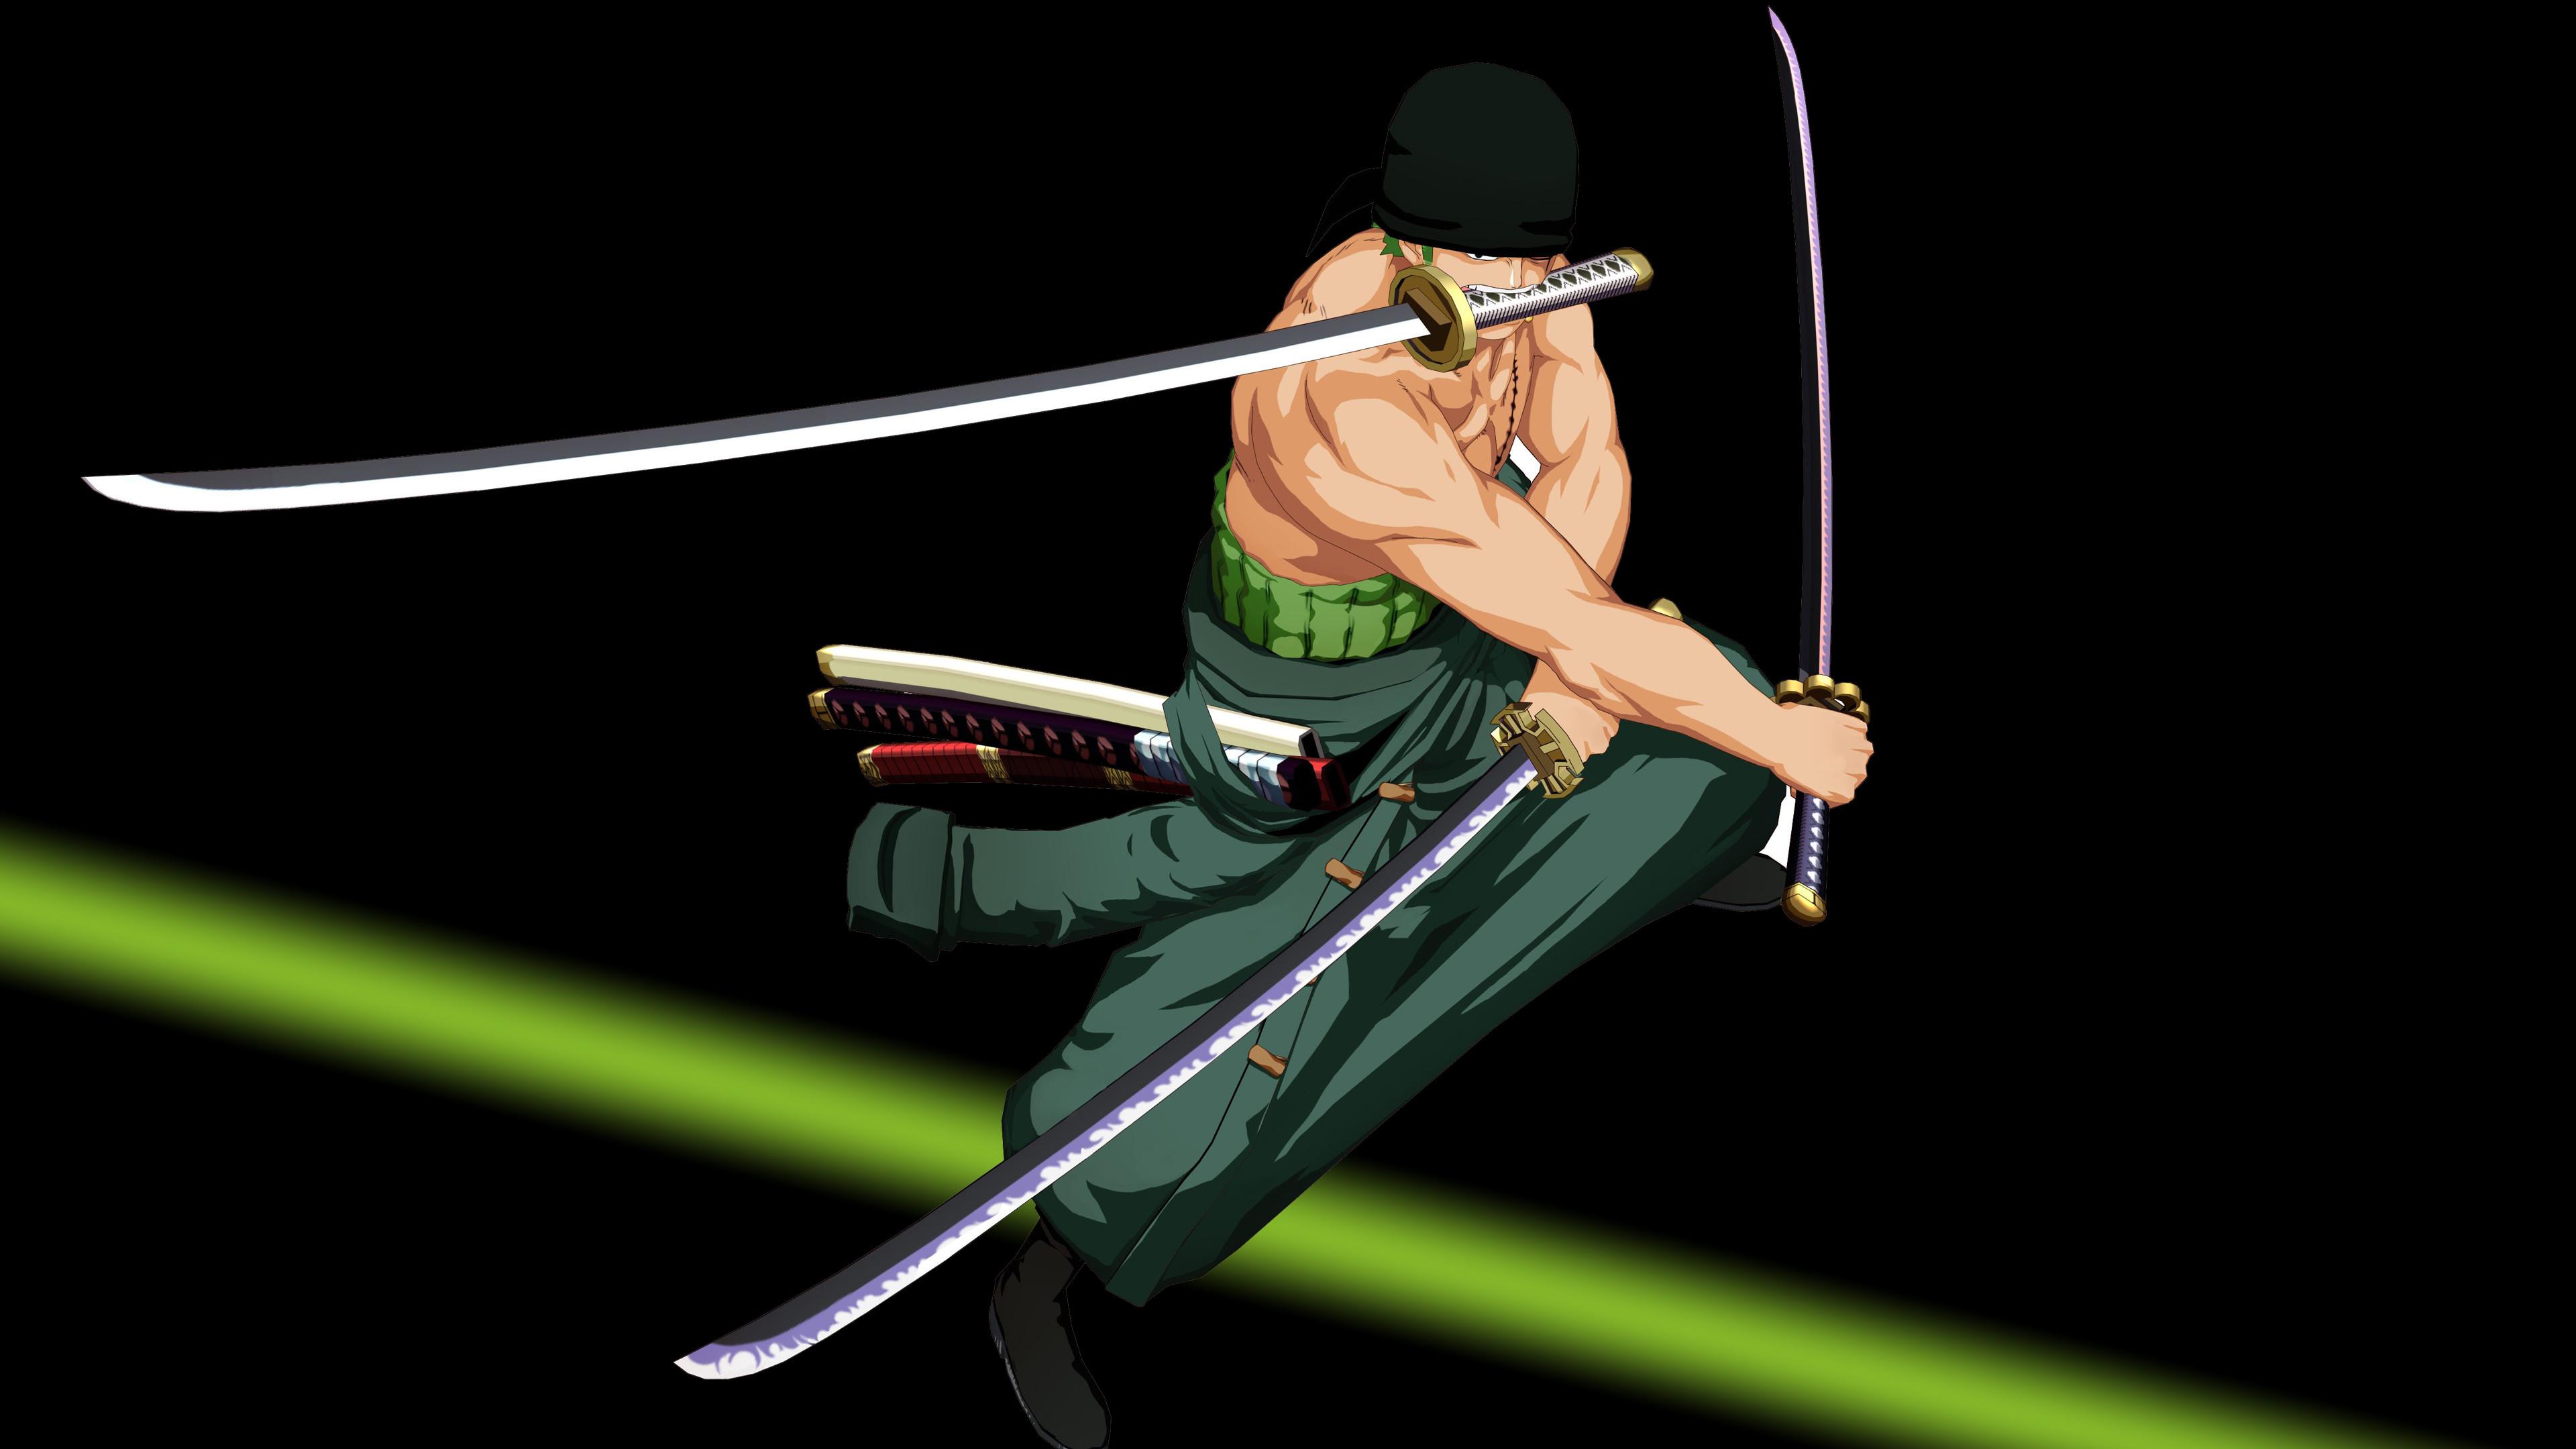 Image Result For Anime Wallpaper Downloada